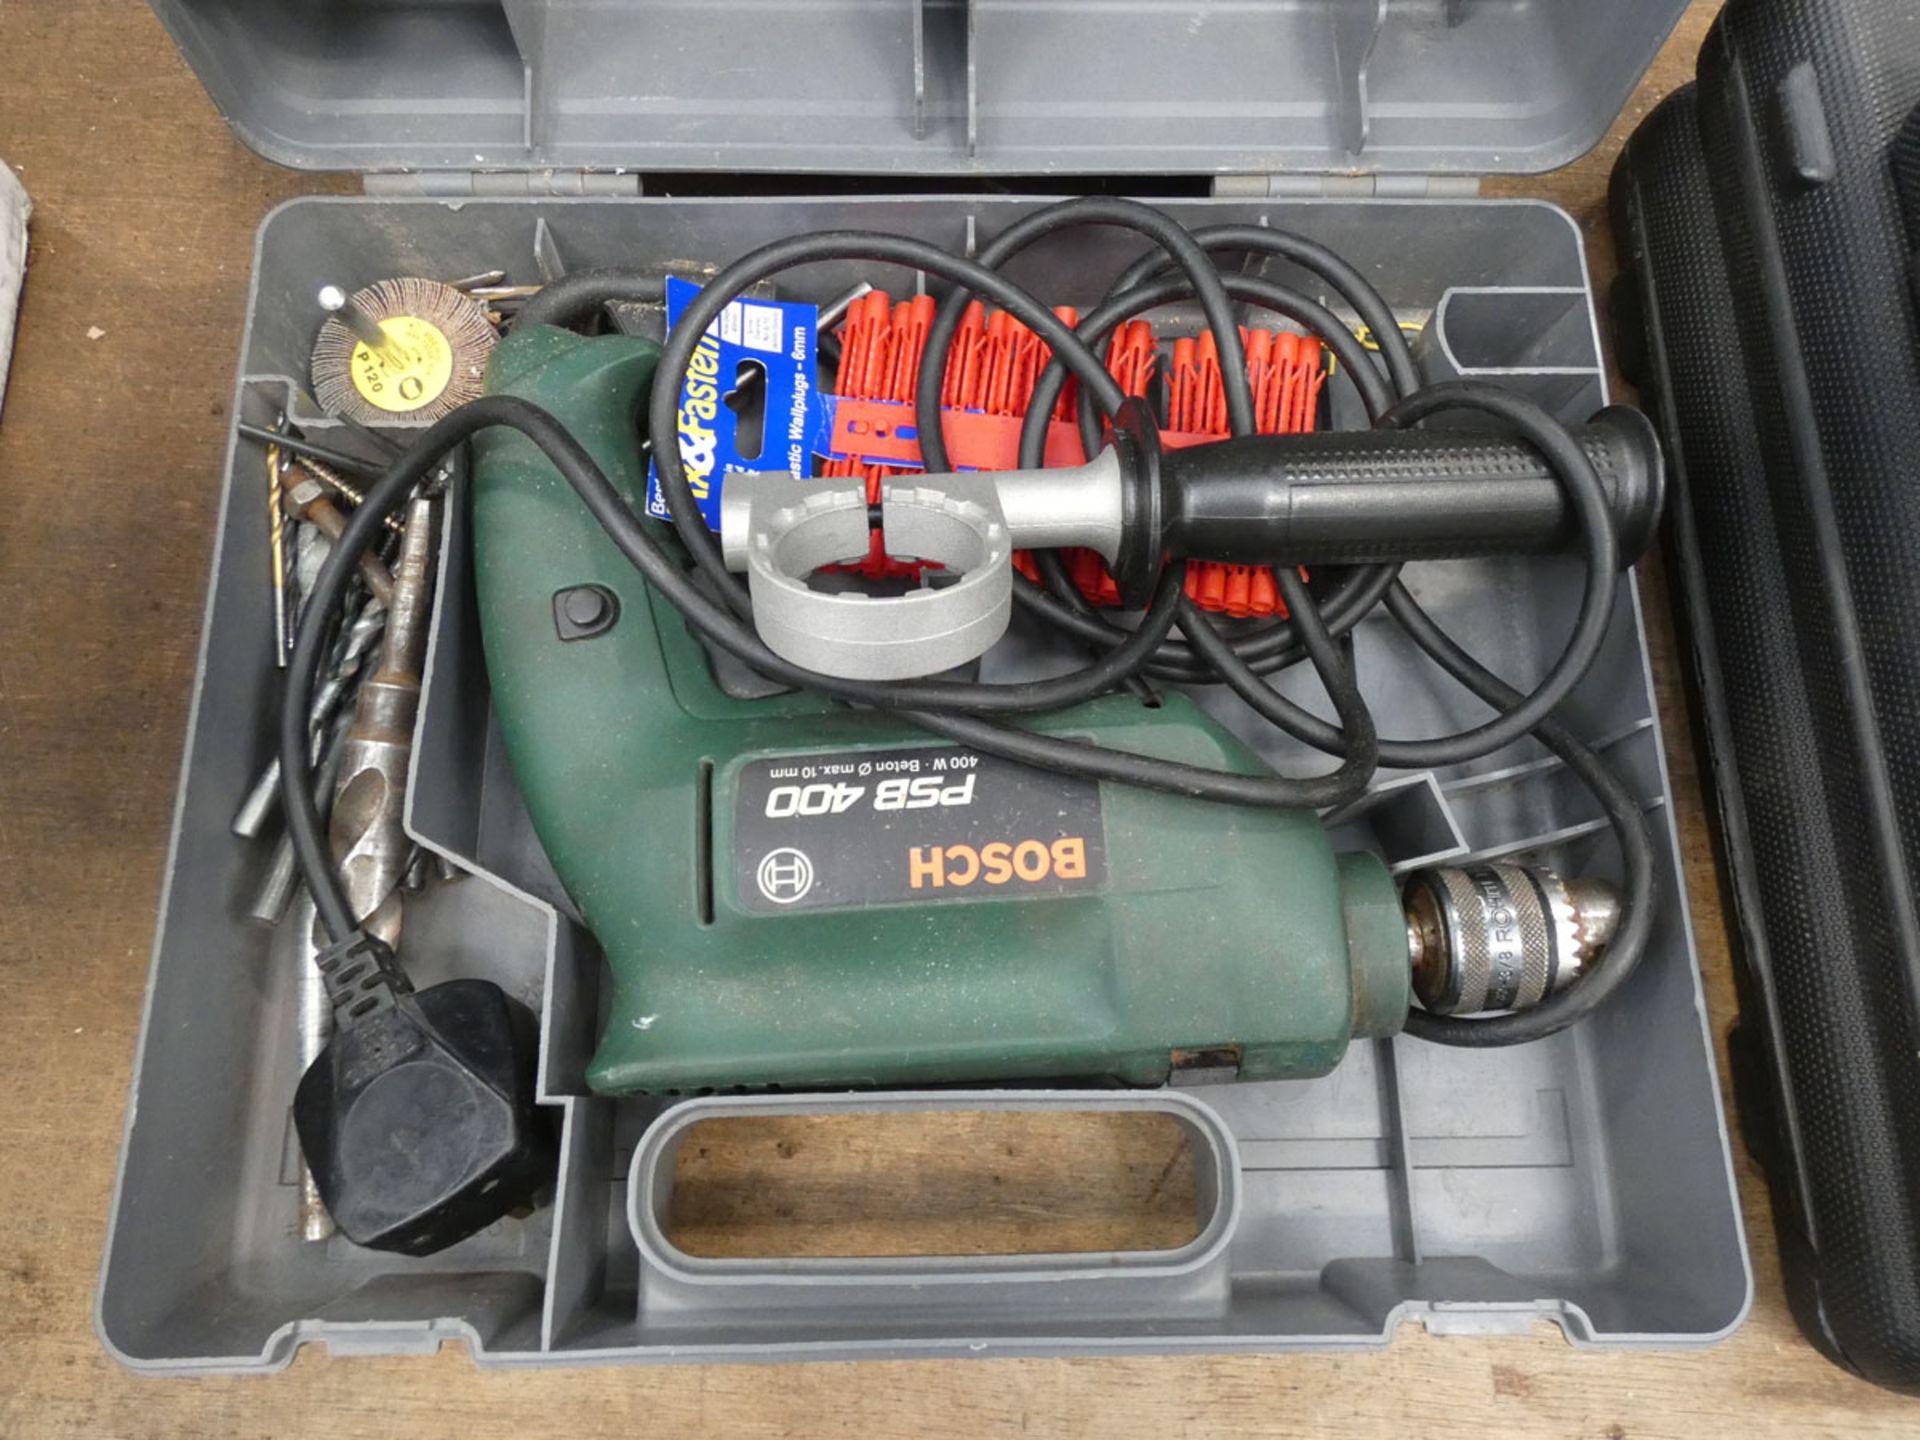 Newtool screwdriver set, Bosch drill, mini grinding heads and a drill bit set - Image 3 of 6